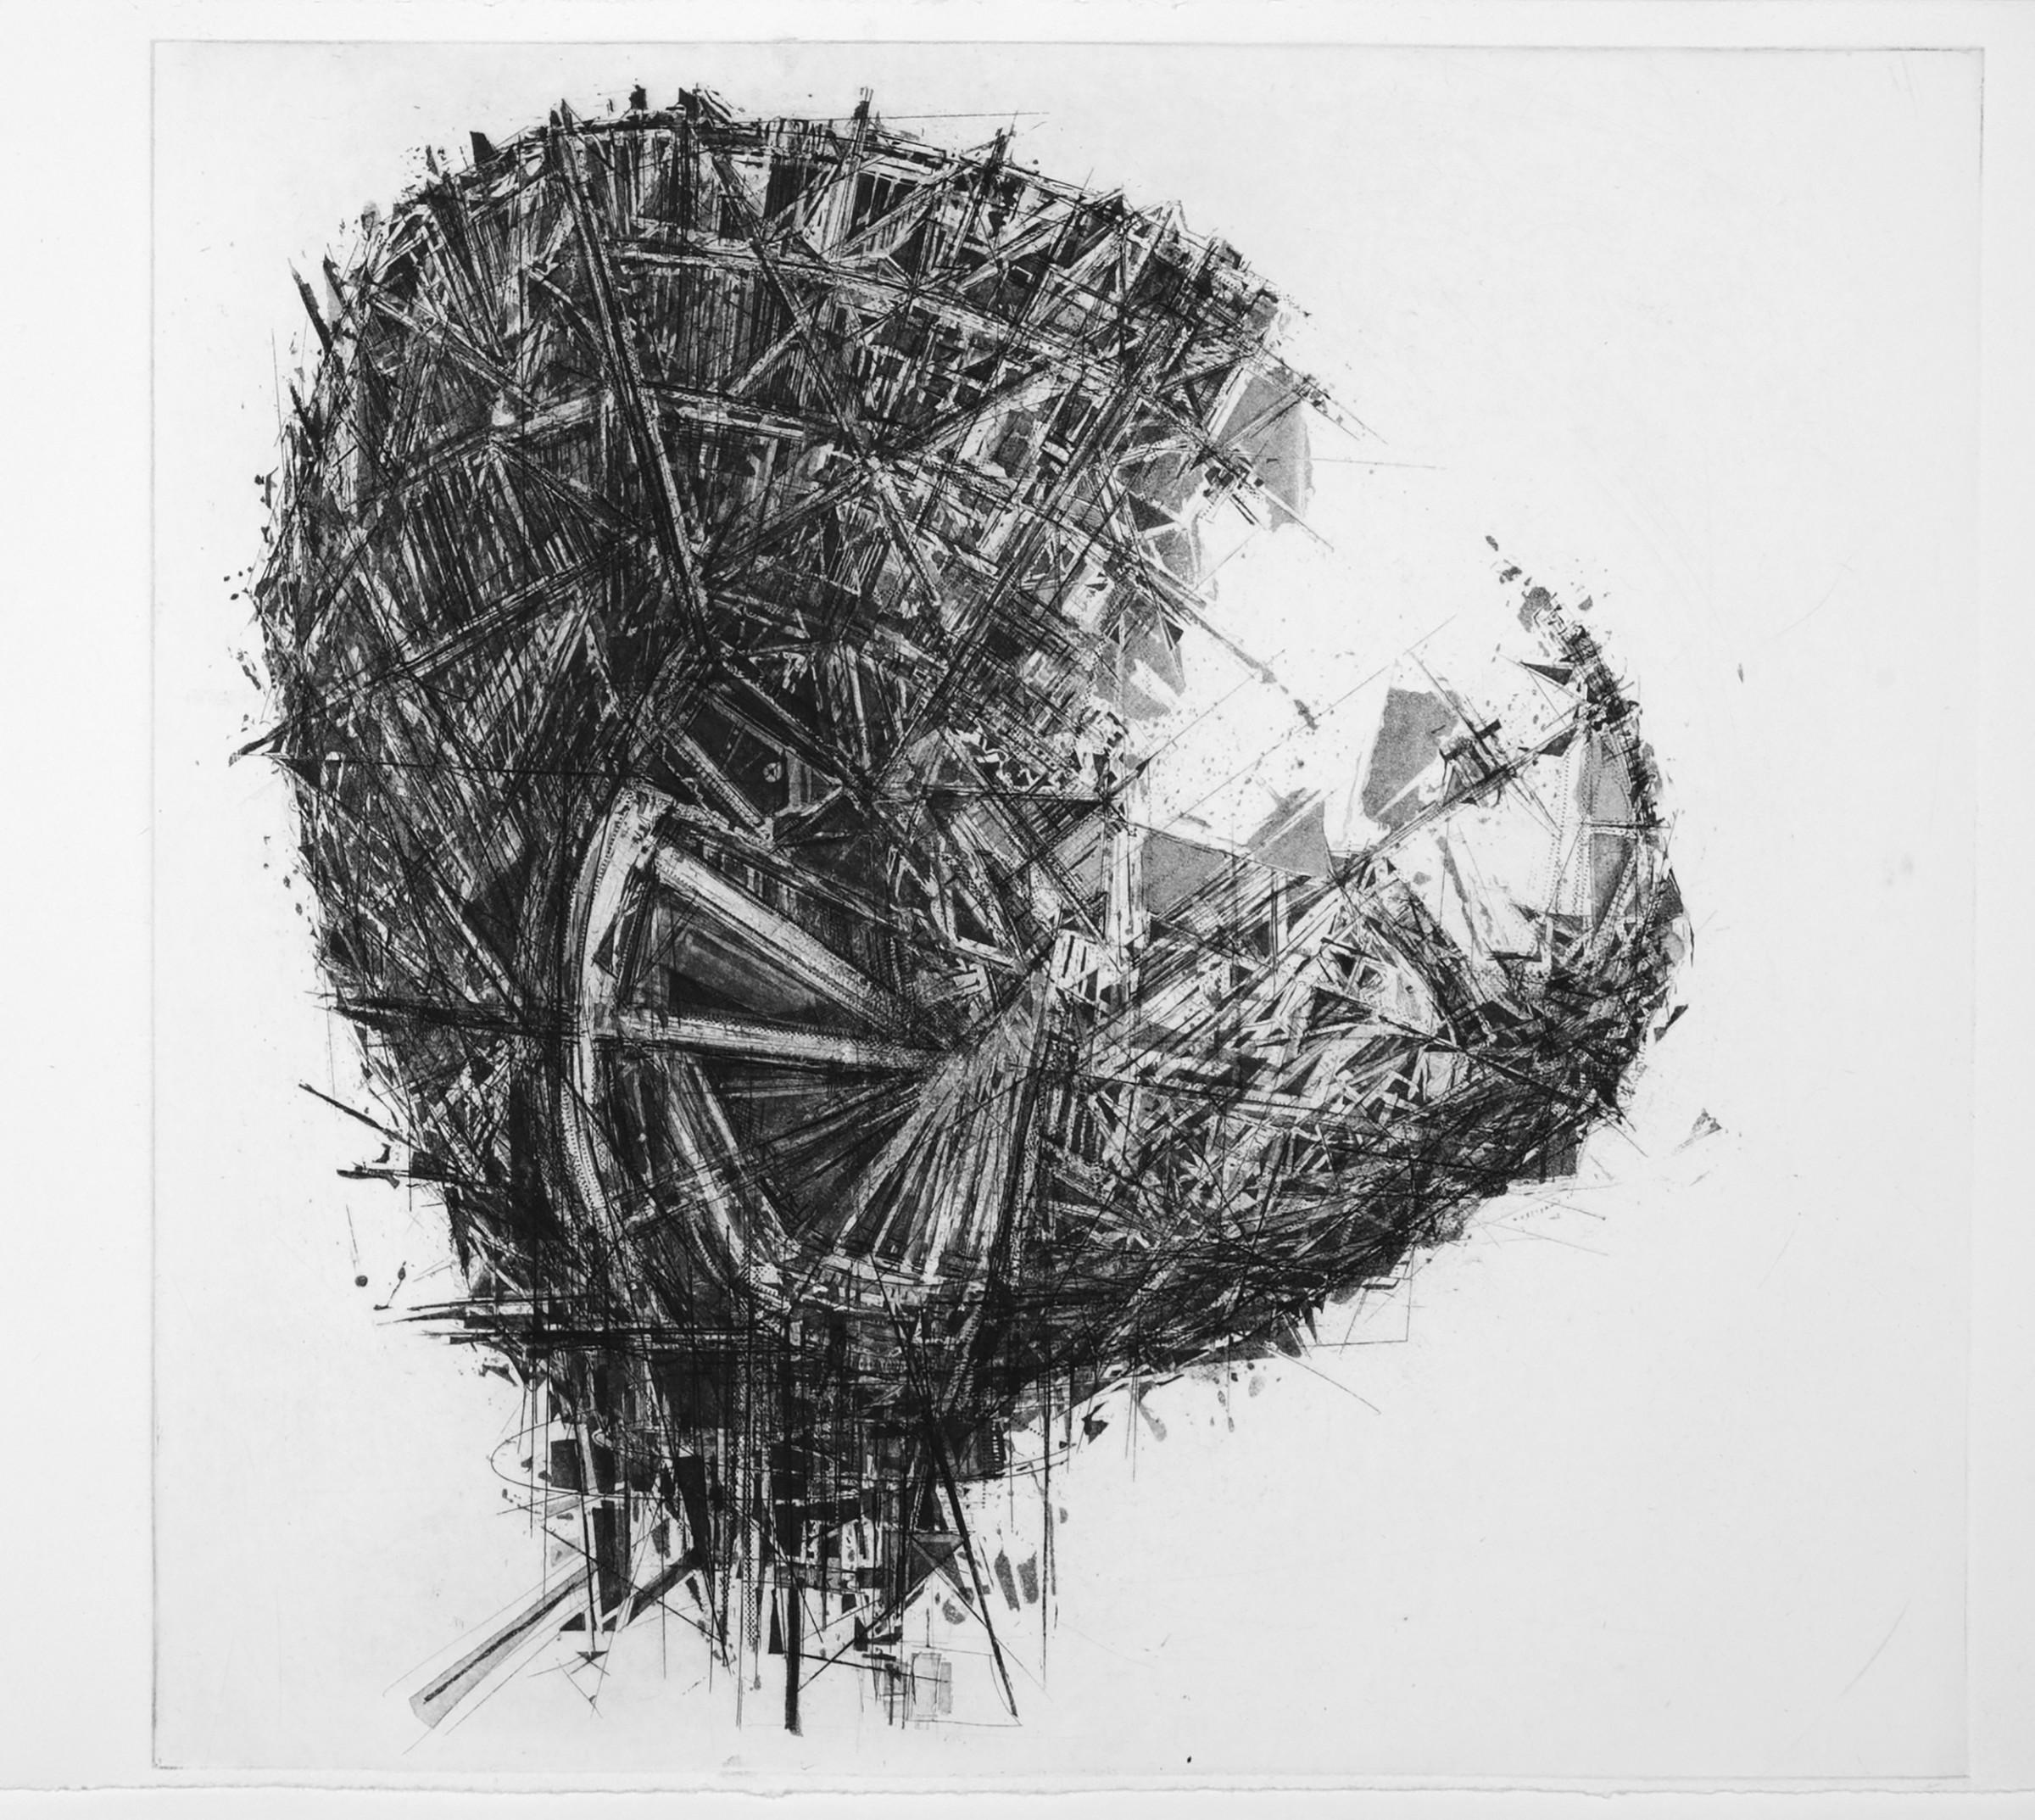 "<span class=""link fancybox-details-link""><a href=""/exhibitions/20/works/artworks_standalone10679/"">View Detail Page</a></span><div class=""artist""><span class=""artist""><strong>Ian Chamberlain ARE</strong></span></div><div class=""title""><em>Sat.IV</em></div><div class=""medium"">etching</div><div class=""dimensions"">48 x 51 cm image size</div><div class=""edition_details"">edition of 30</div>"